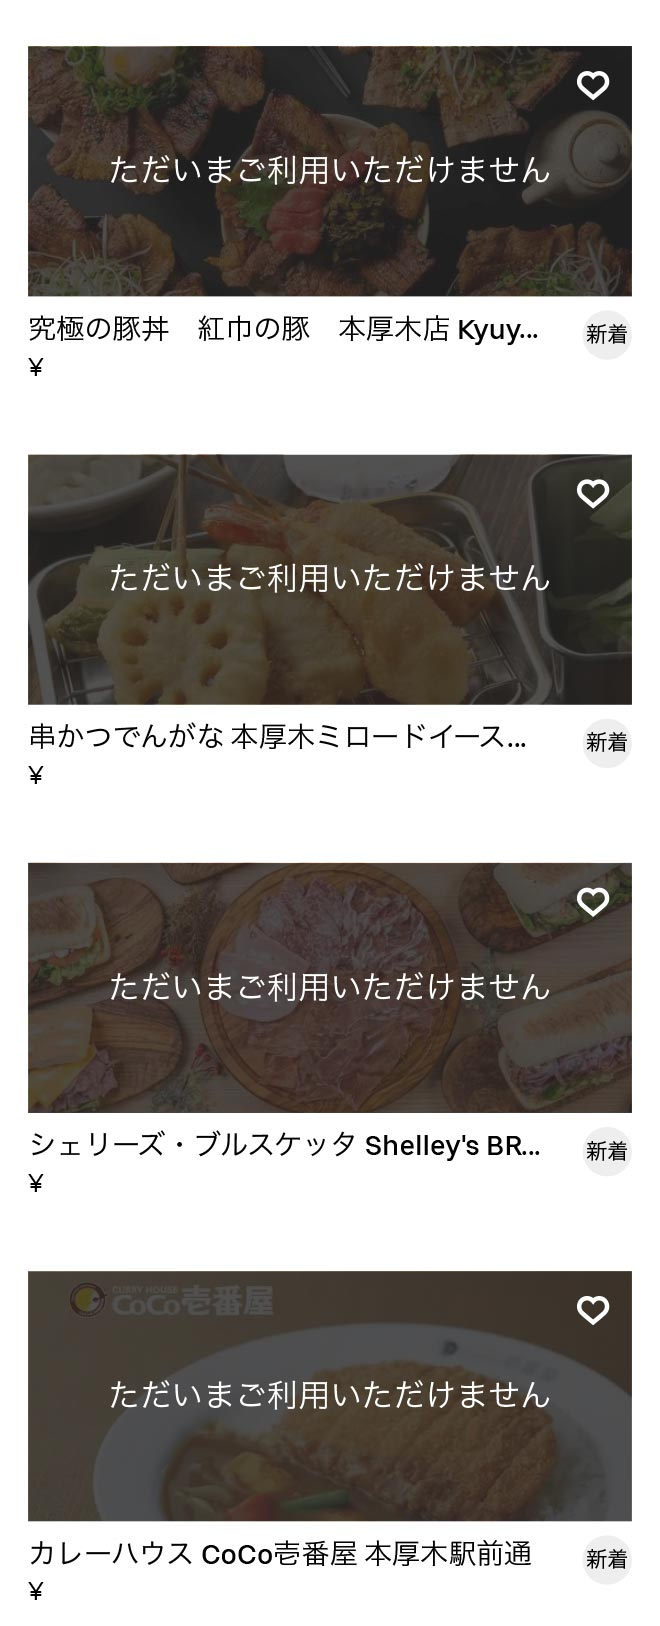 Aiko ishida menu 2010 07